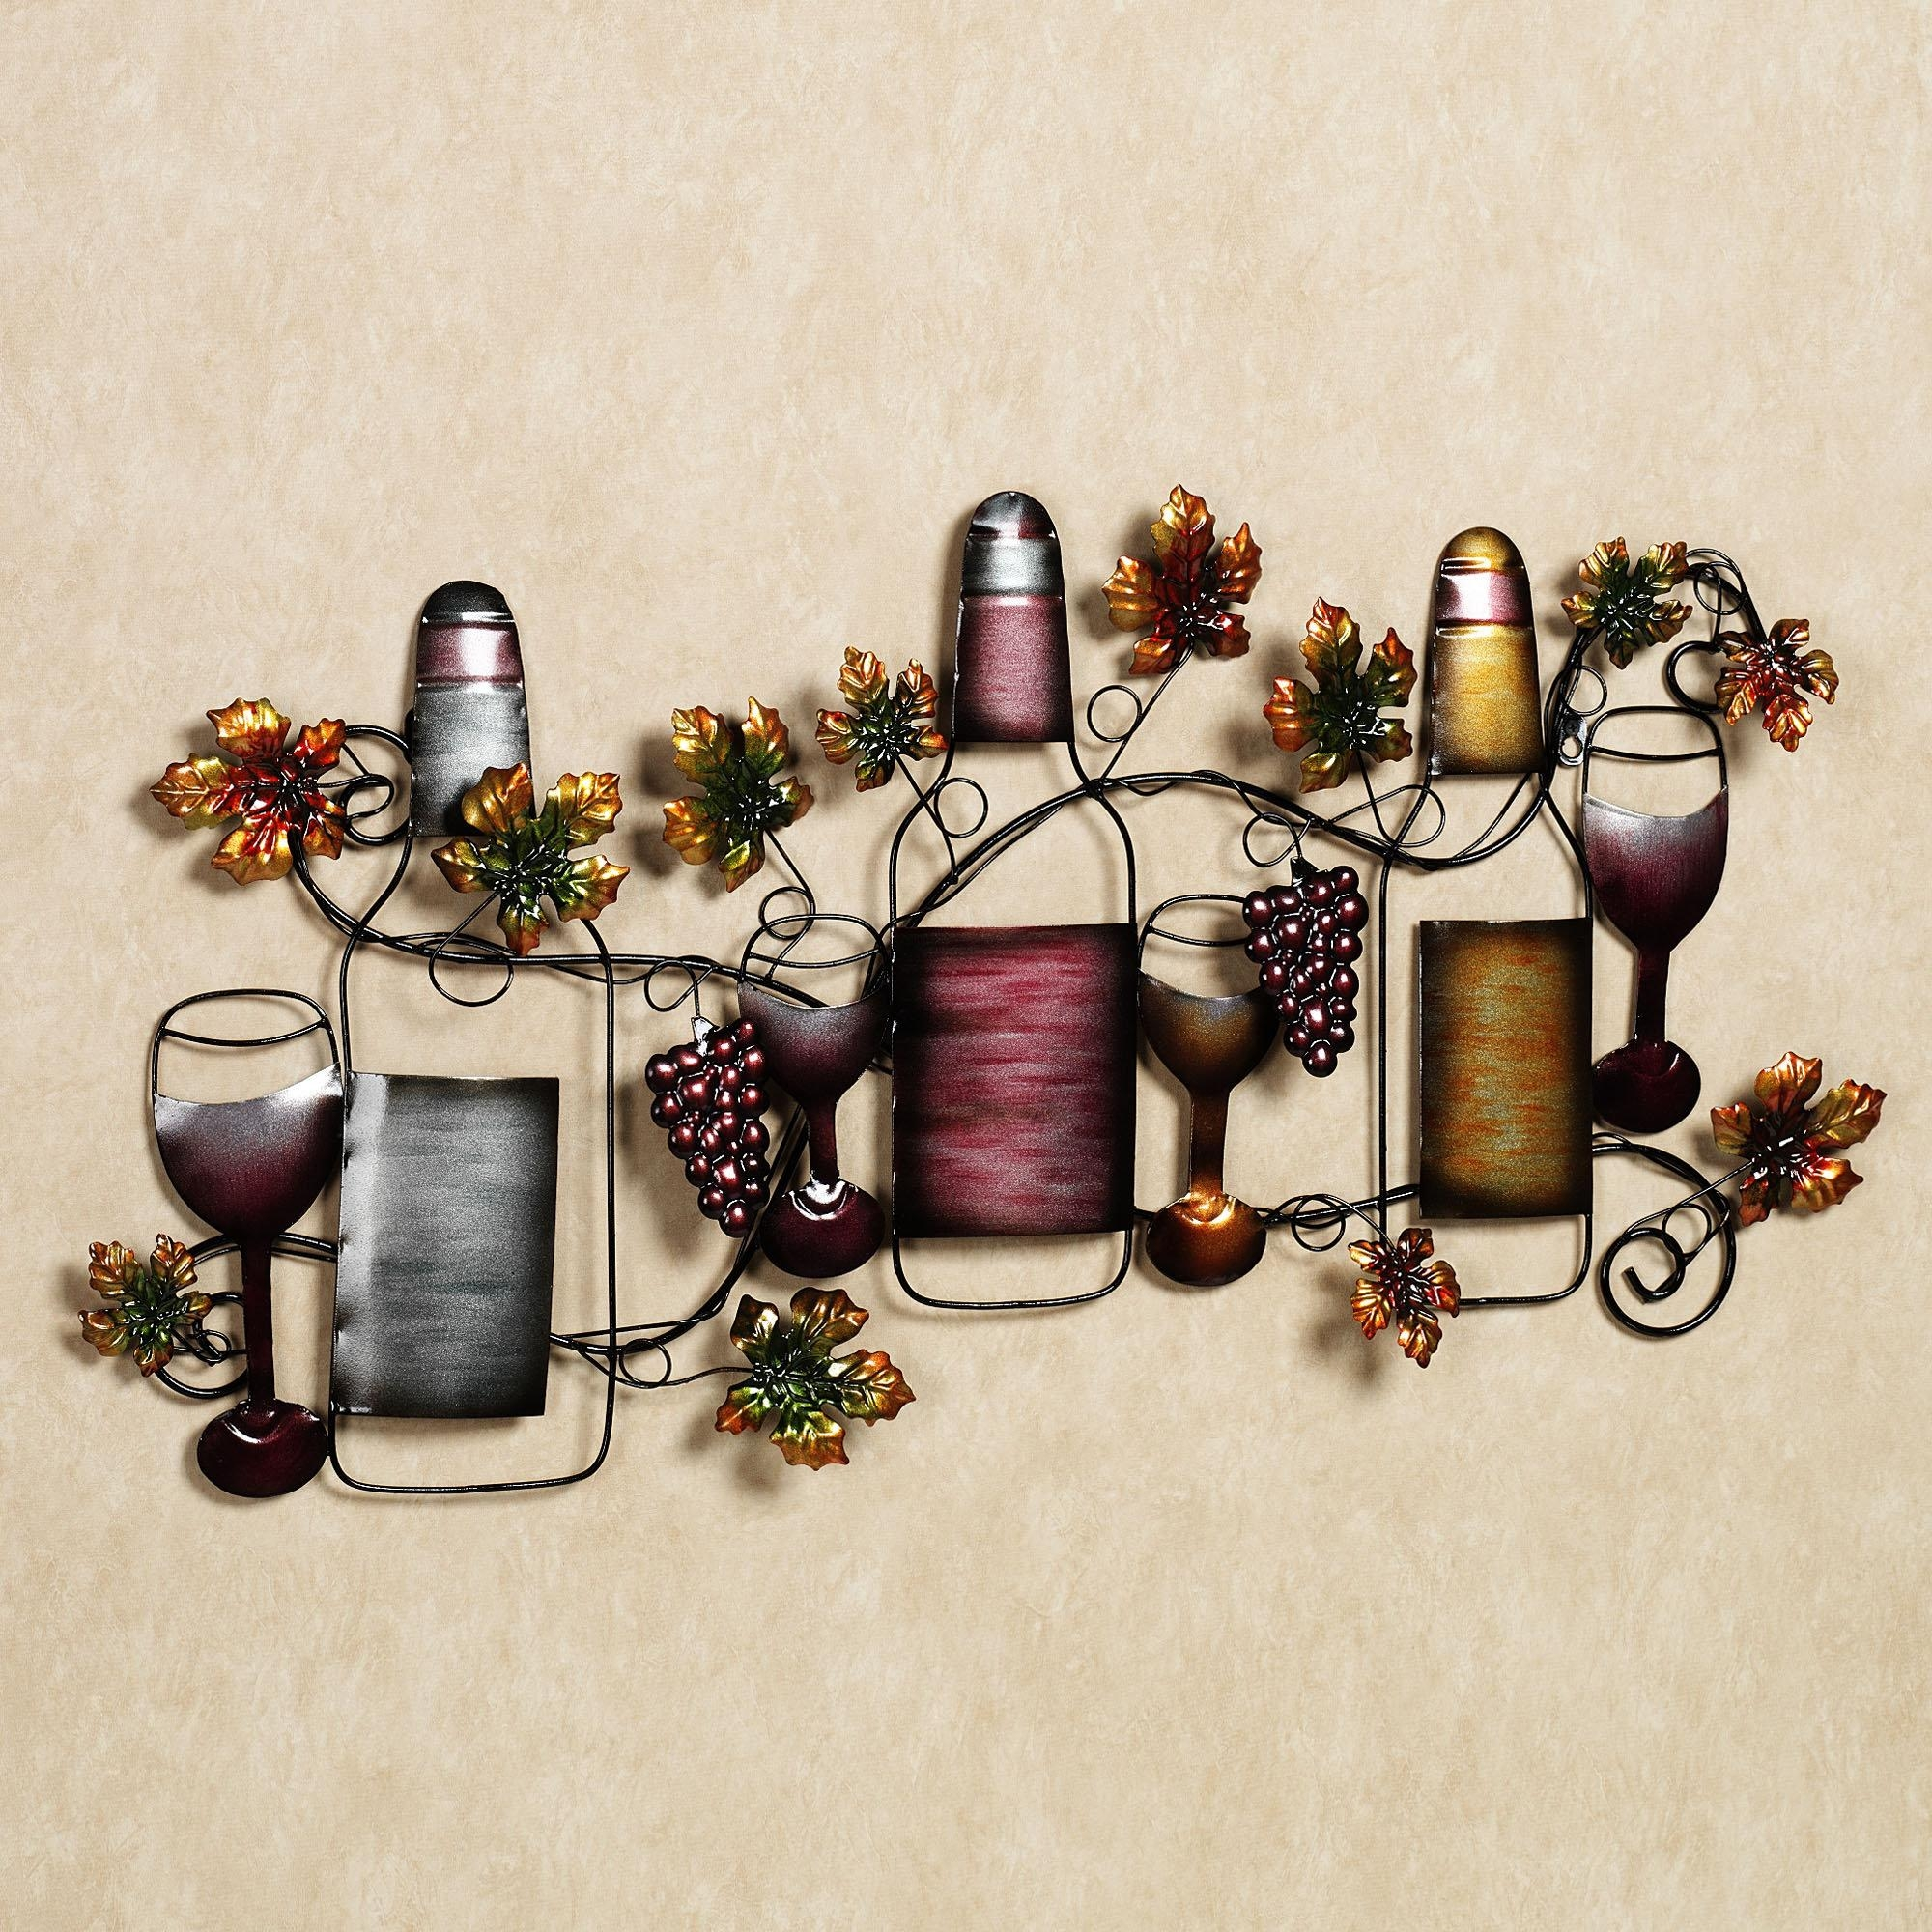 Kitchen Metal Wall Art Decor | Gen4Congress With Wine Metal Wall Art (Image 7 of 20)